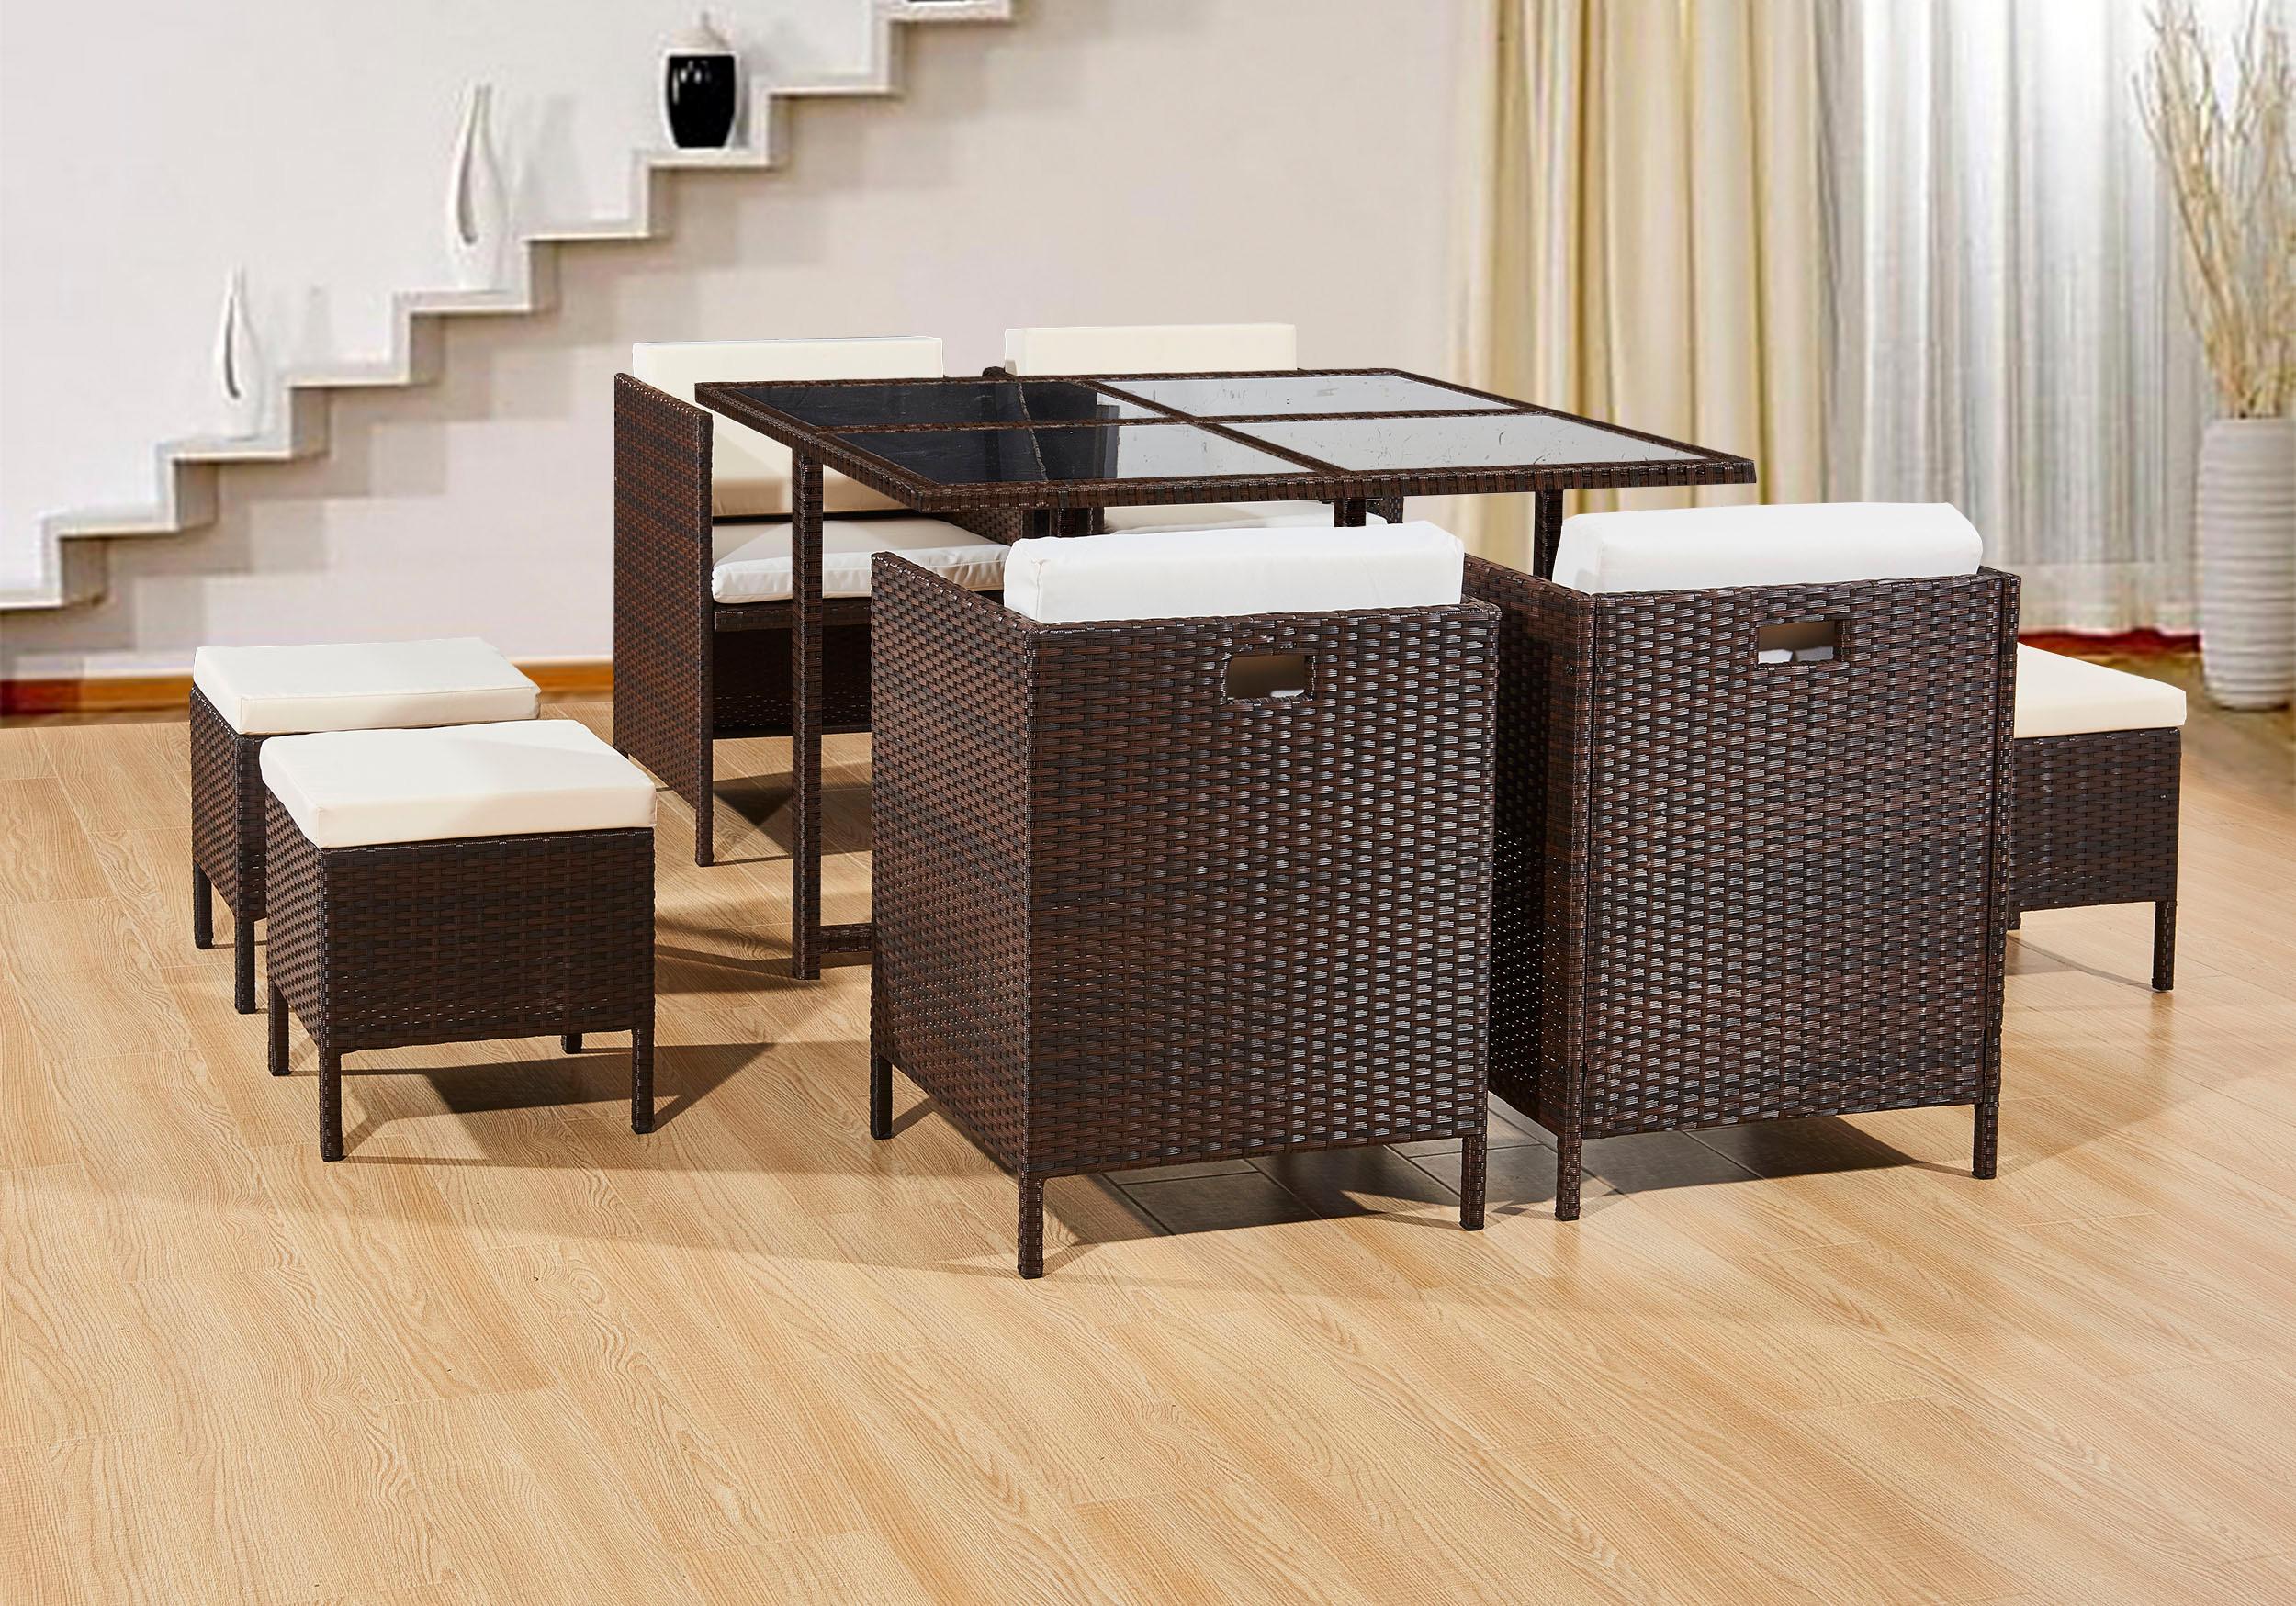 Rattan Garden Furniture Patio Dining Set 8 Seat Cube